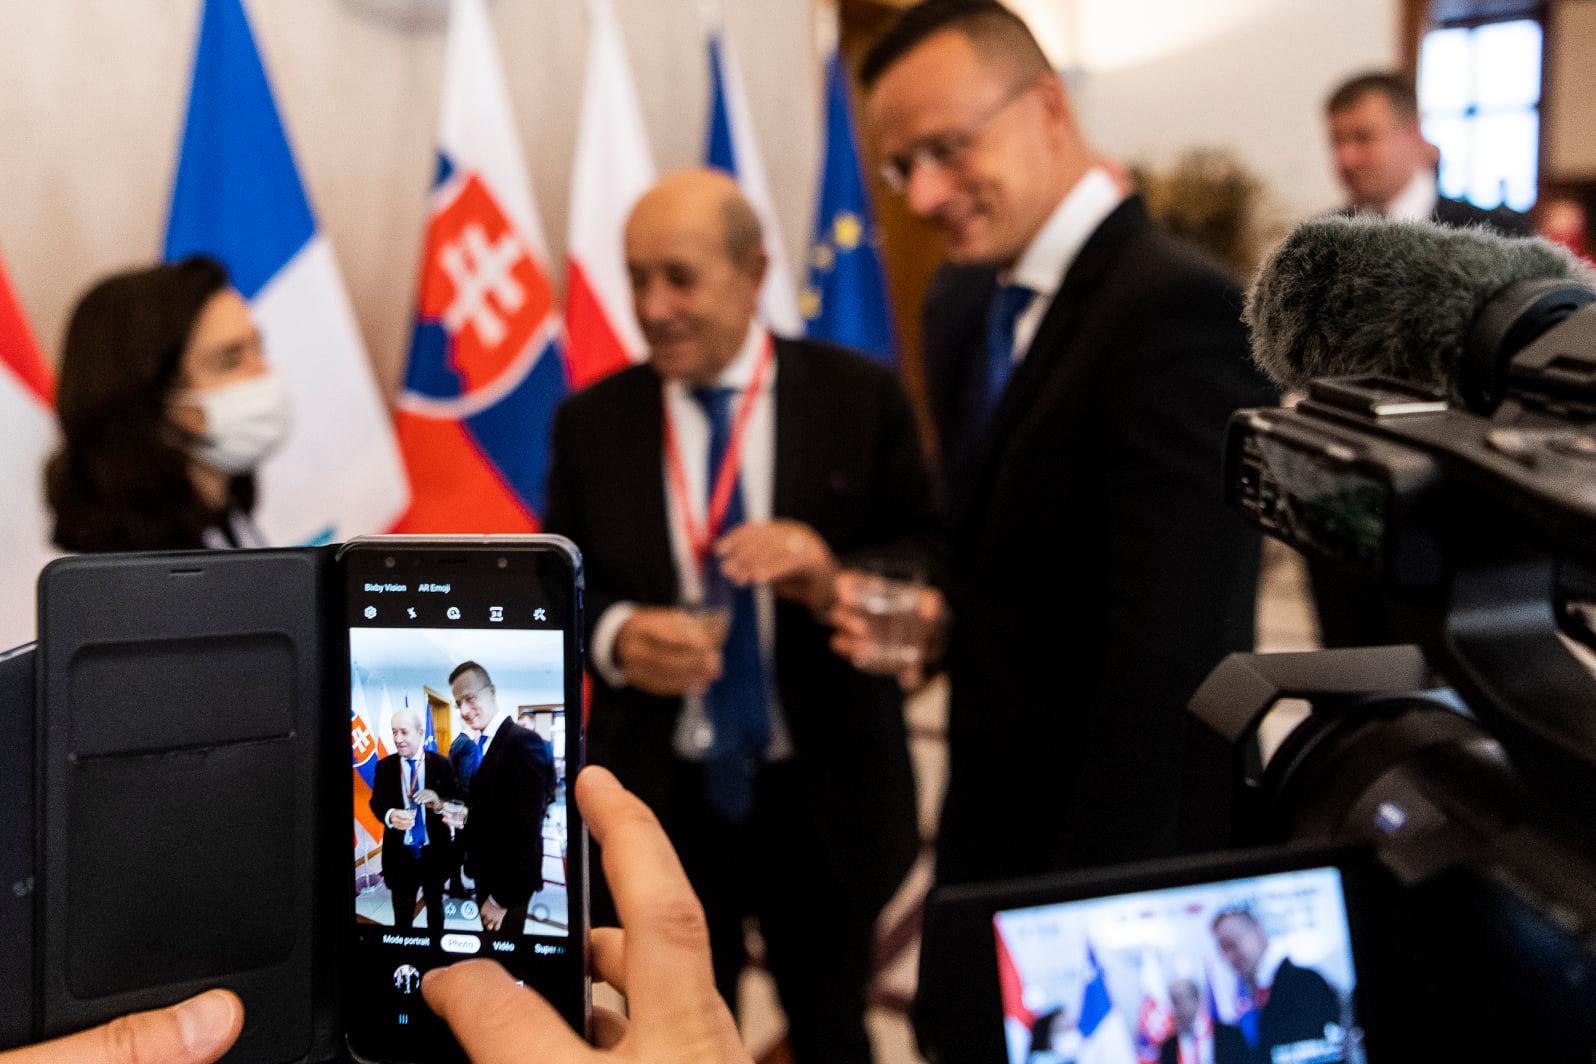 Szijjártó: Three Main Risks Regarding Migration Are Due to EU's Approach post's picture